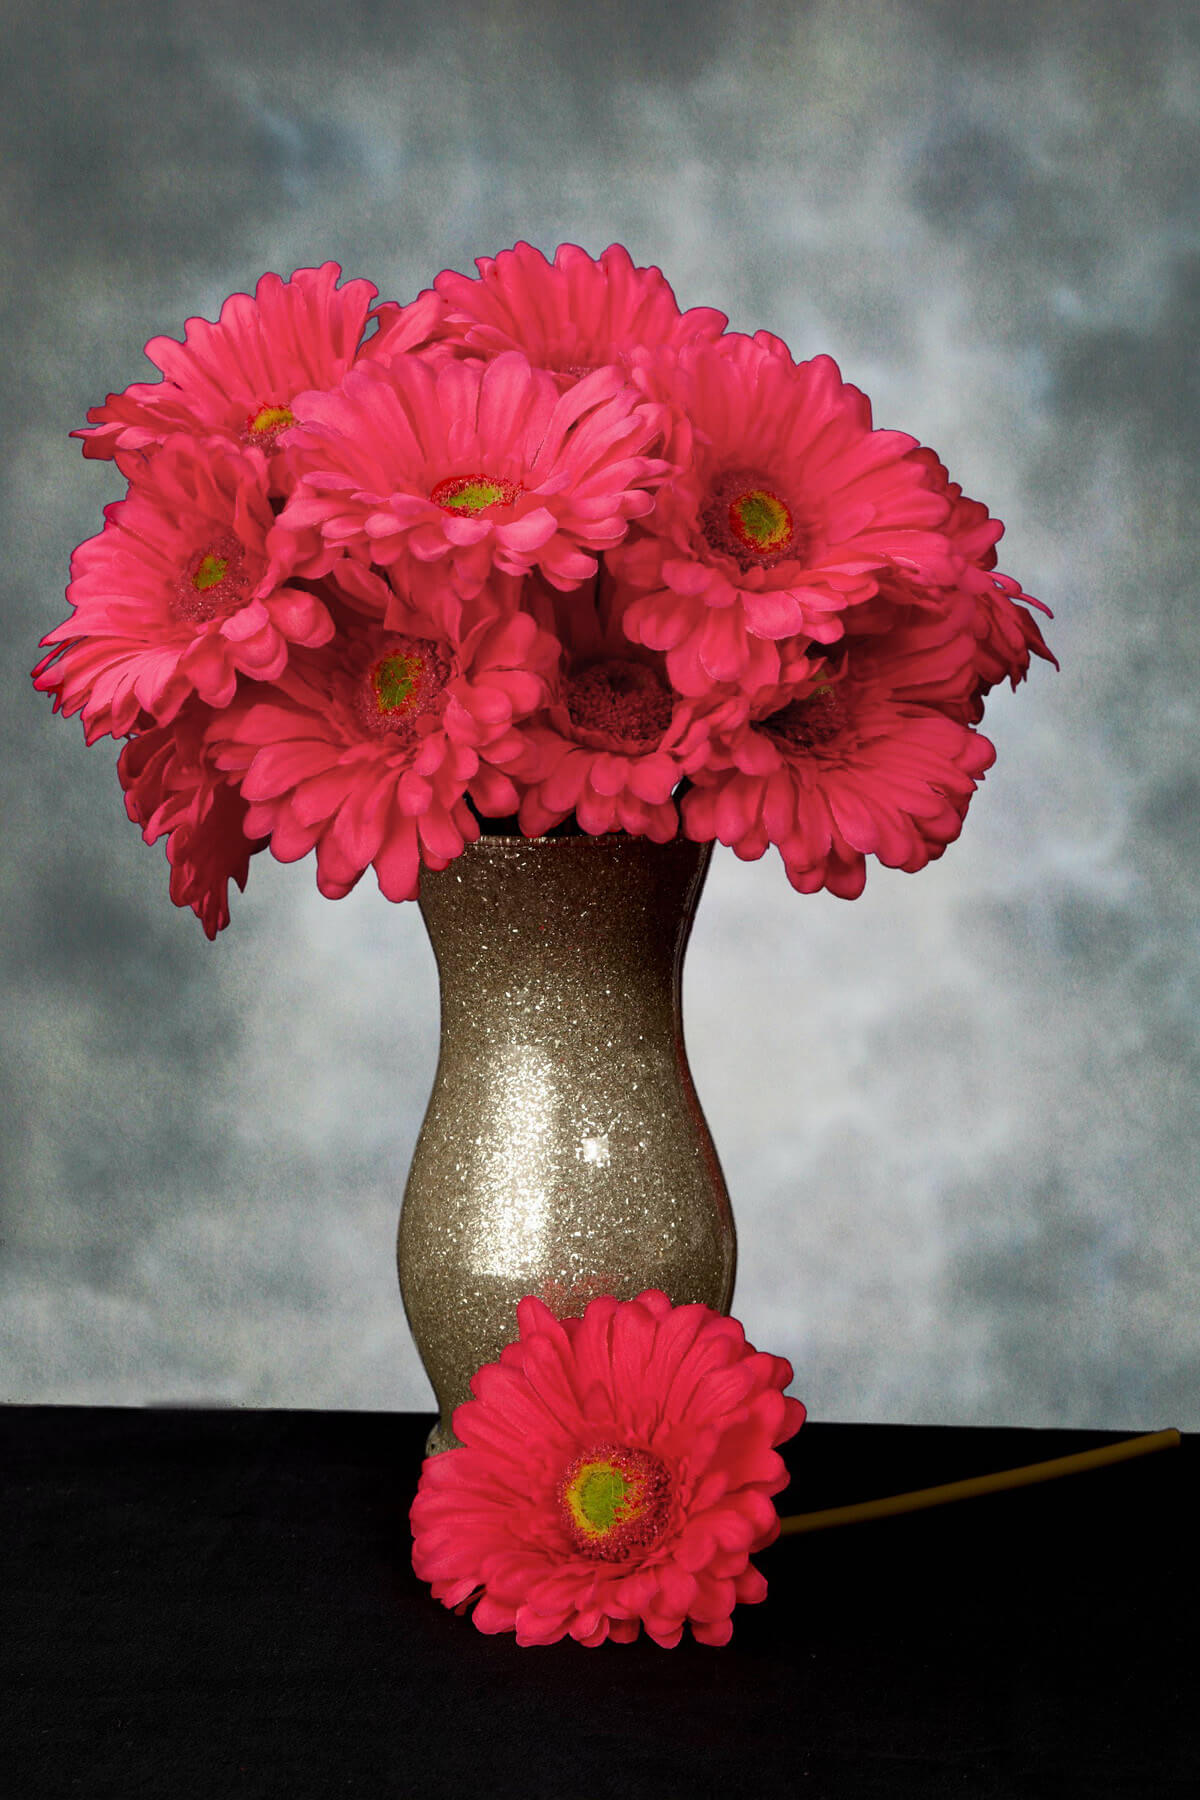 Gerbera Daisy Stem Pink Beauty 9in Pack of 24